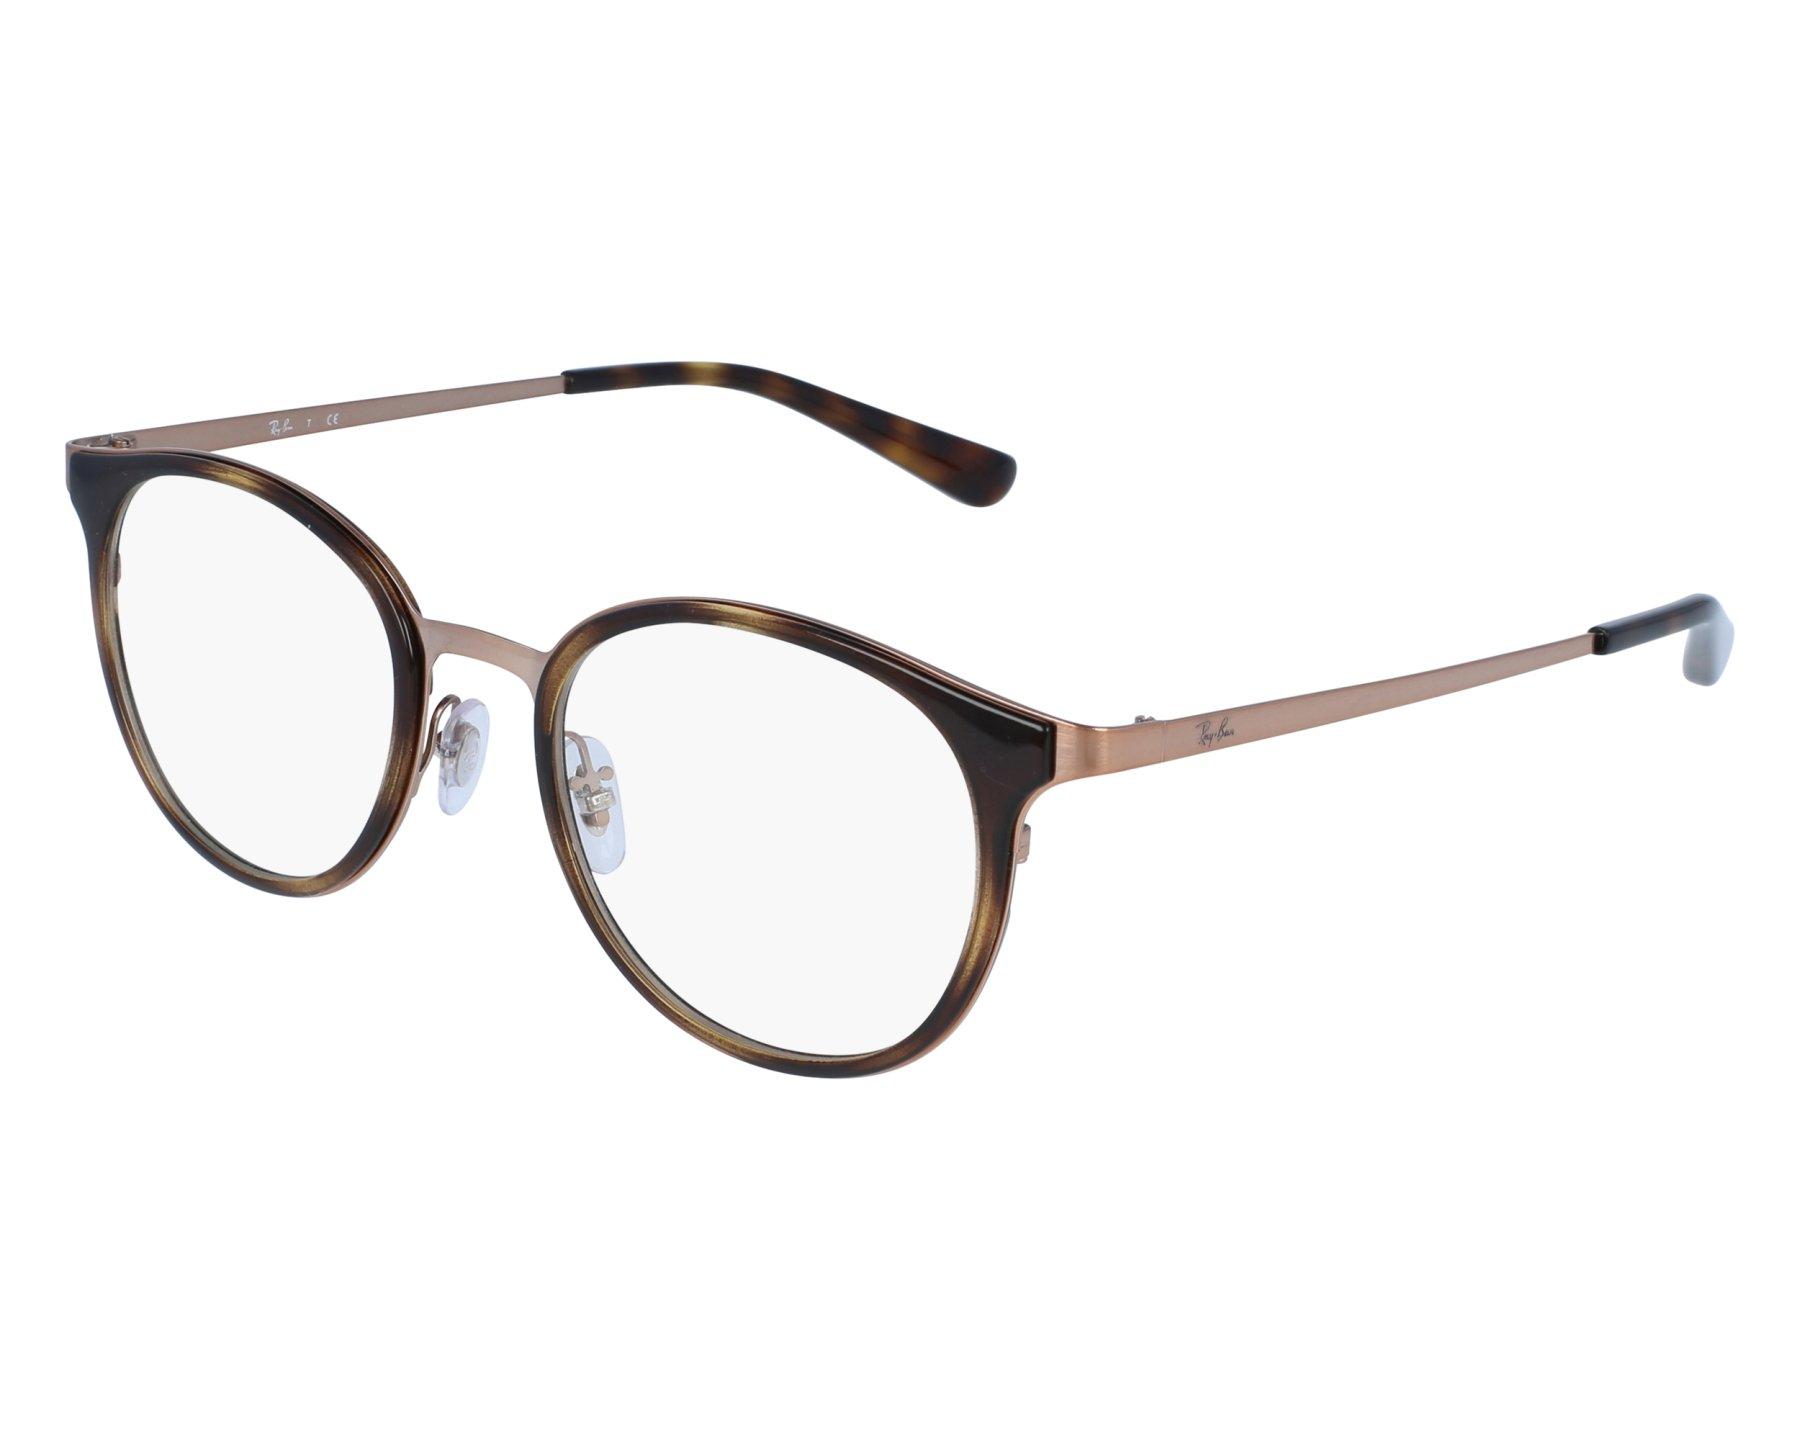 eyeglasses Ray-Ban RX-6372-M 2732 50-19 Bronze Havana front